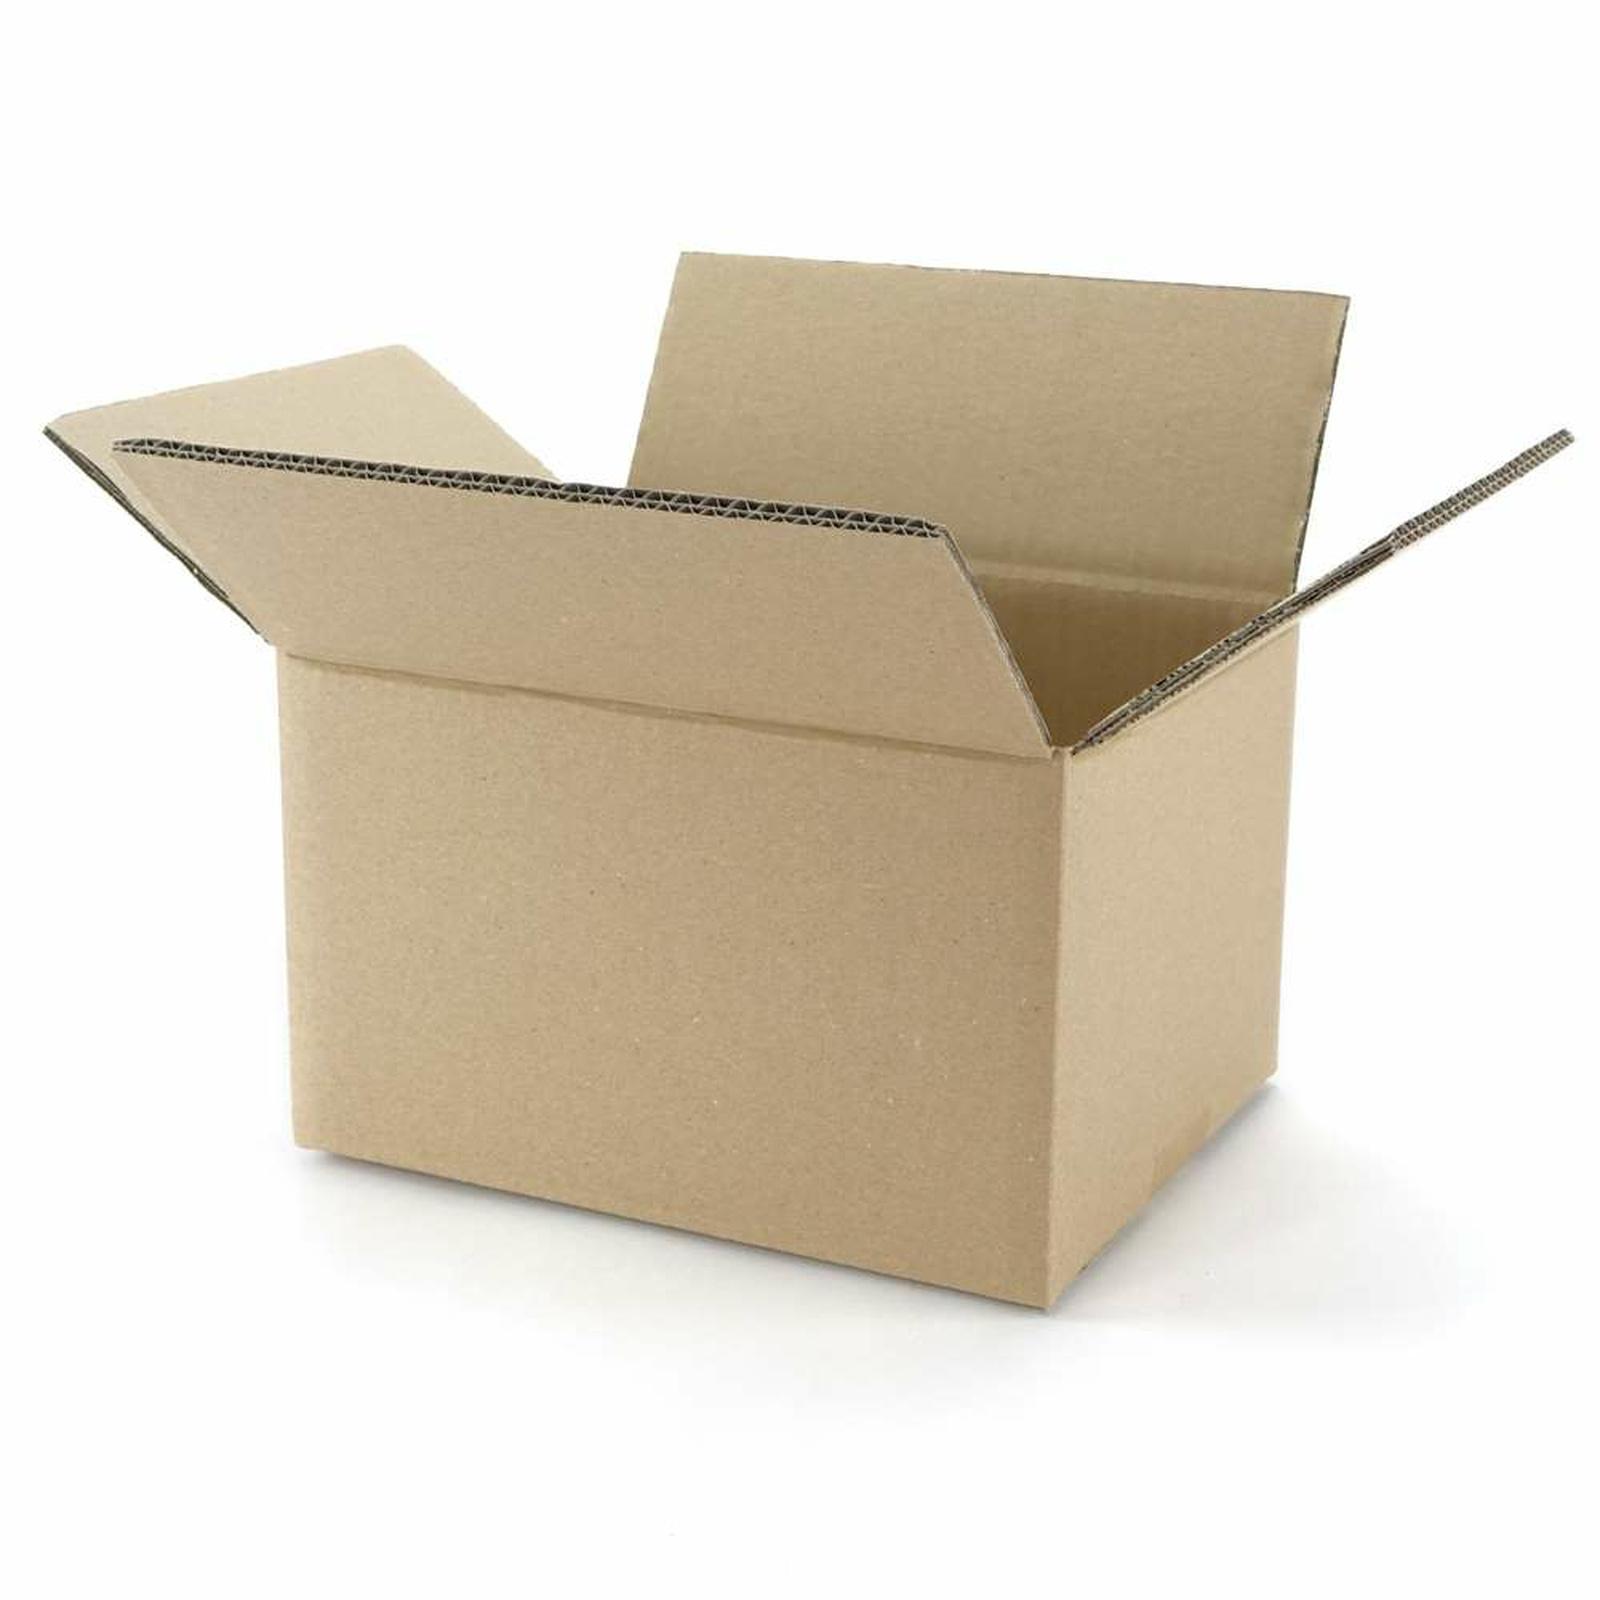 zweiwellige kartons 250x200x150 mm g nstig kaufen 0 44. Black Bedroom Furniture Sets. Home Design Ideas